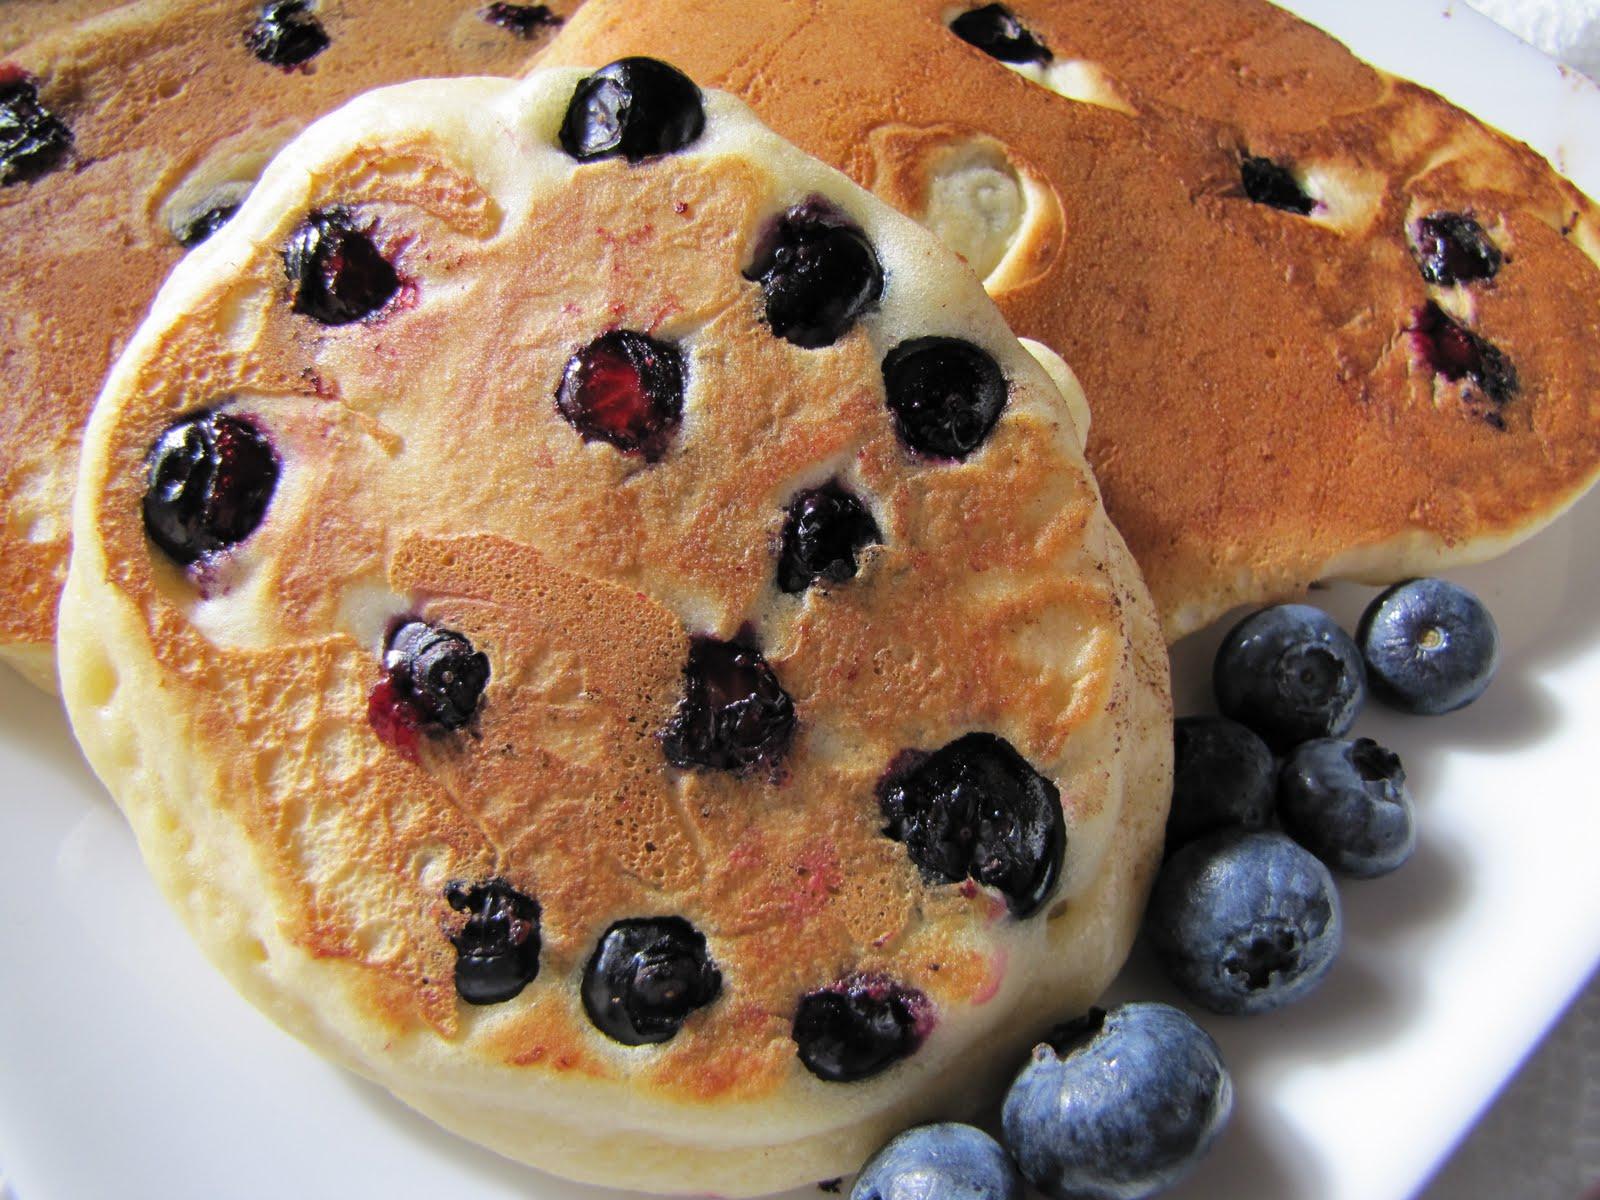 Adventures in Food: Lemon-Blueberry Pancakes